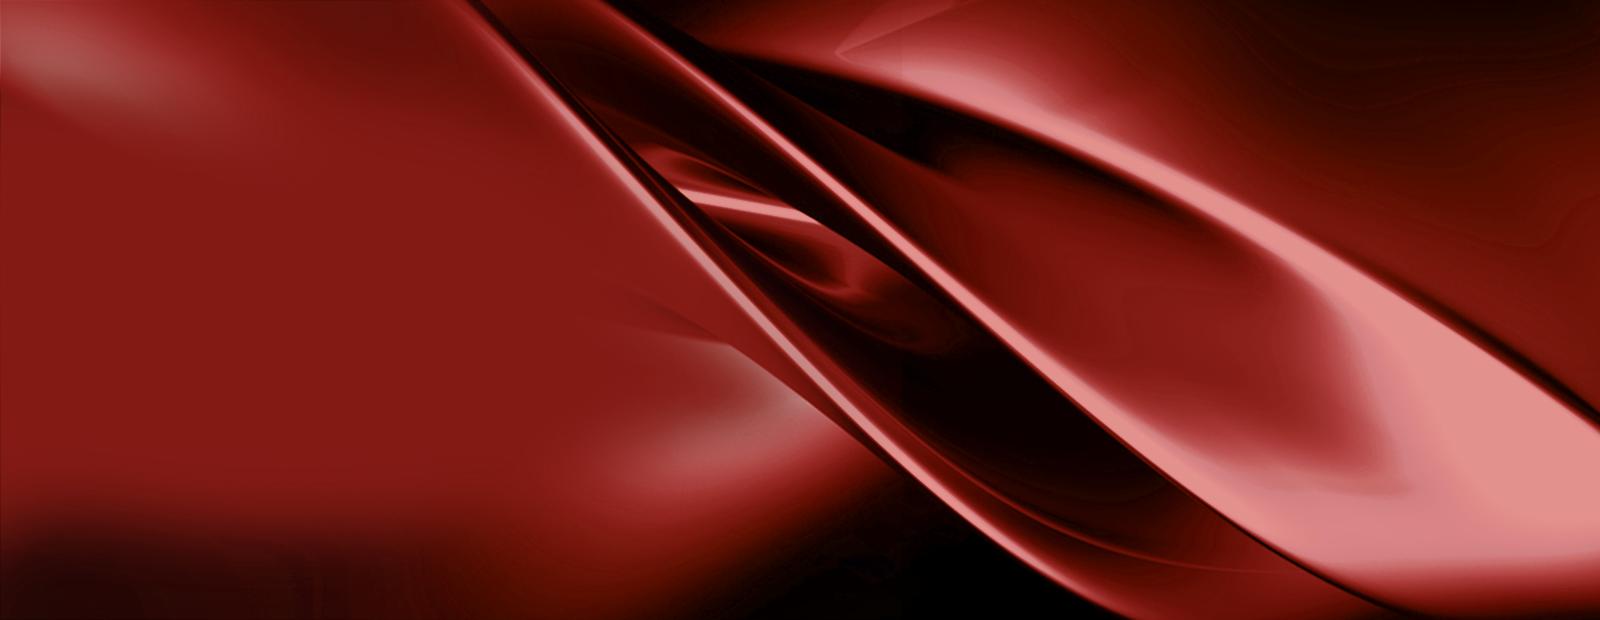 Algoflon-PTFE-abstract